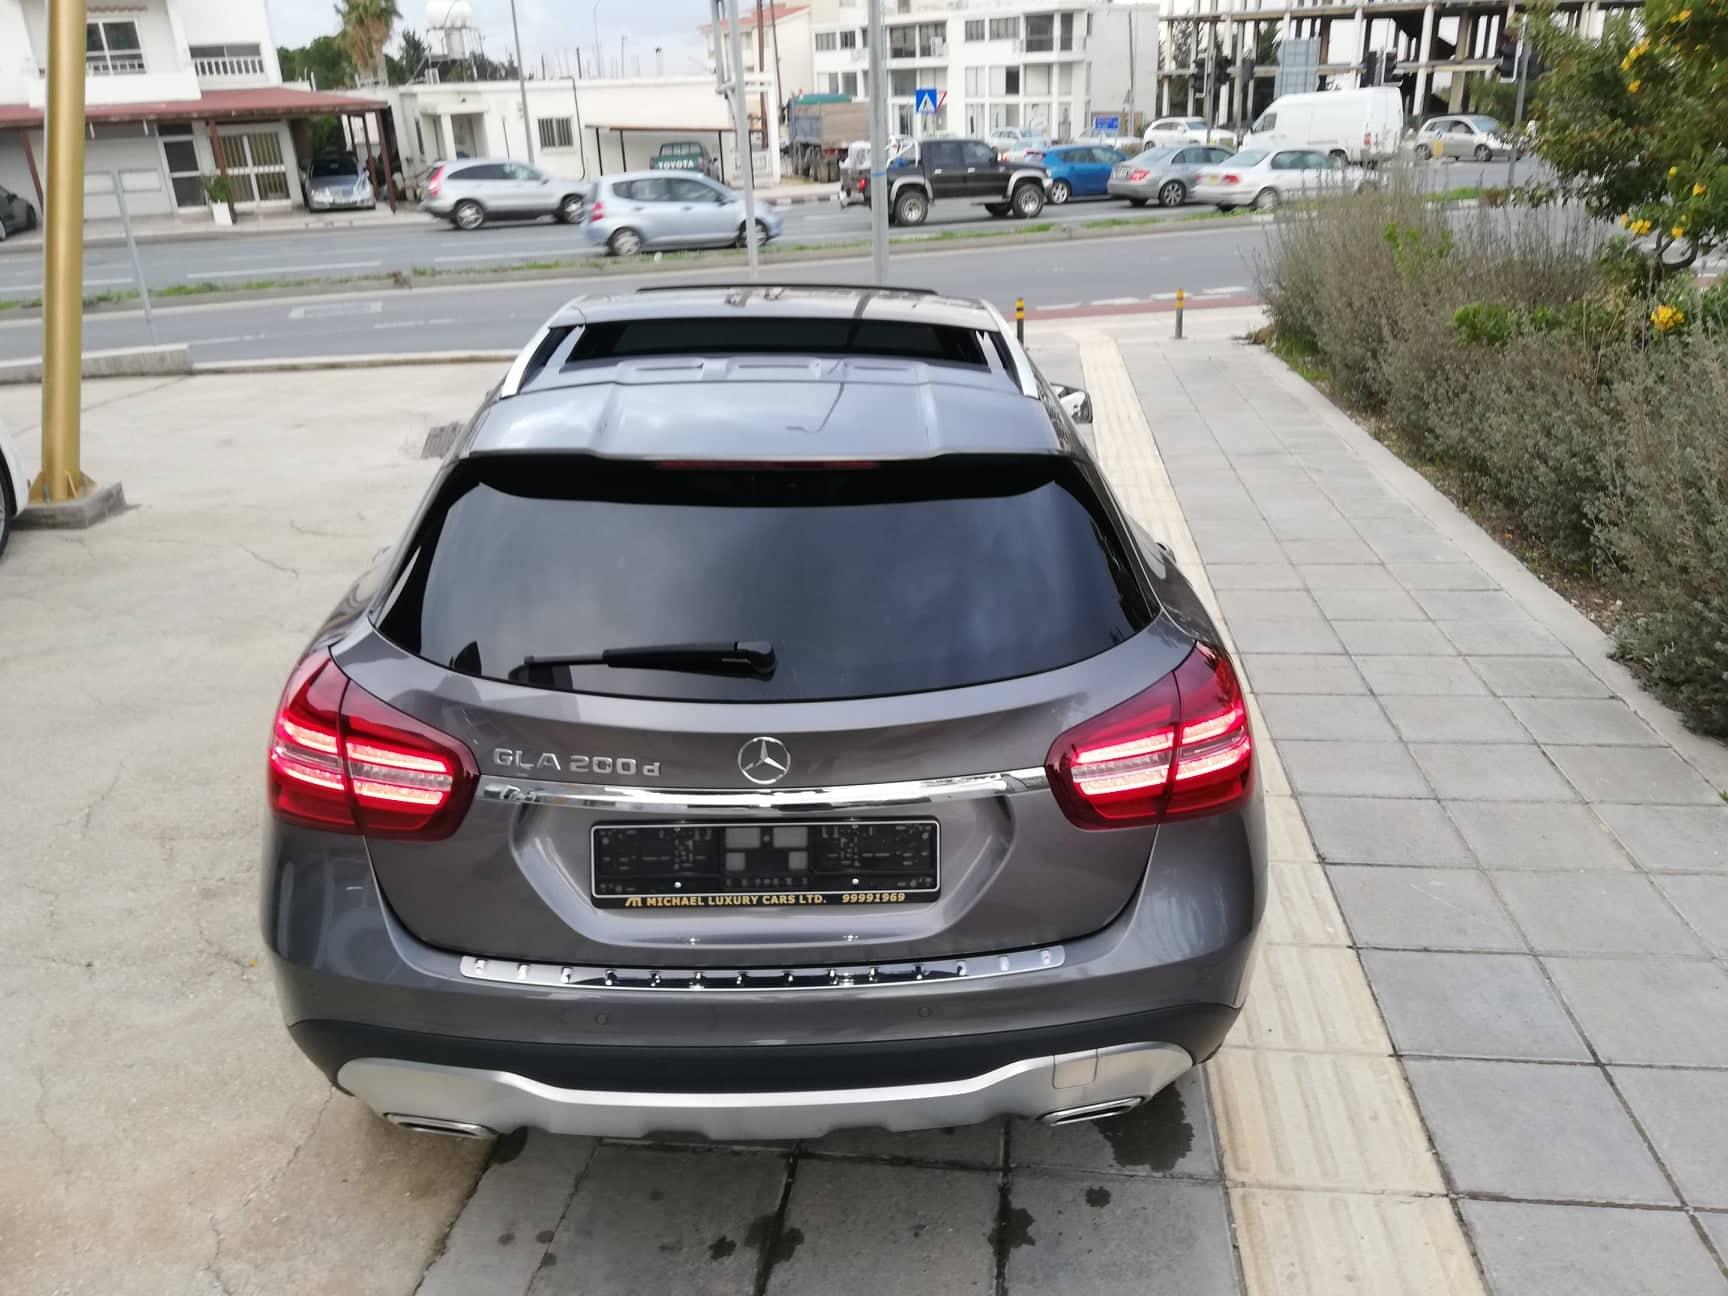 MERCEDES BENZ GLA 200 D SPORT PREMIUM PLUS AUTO